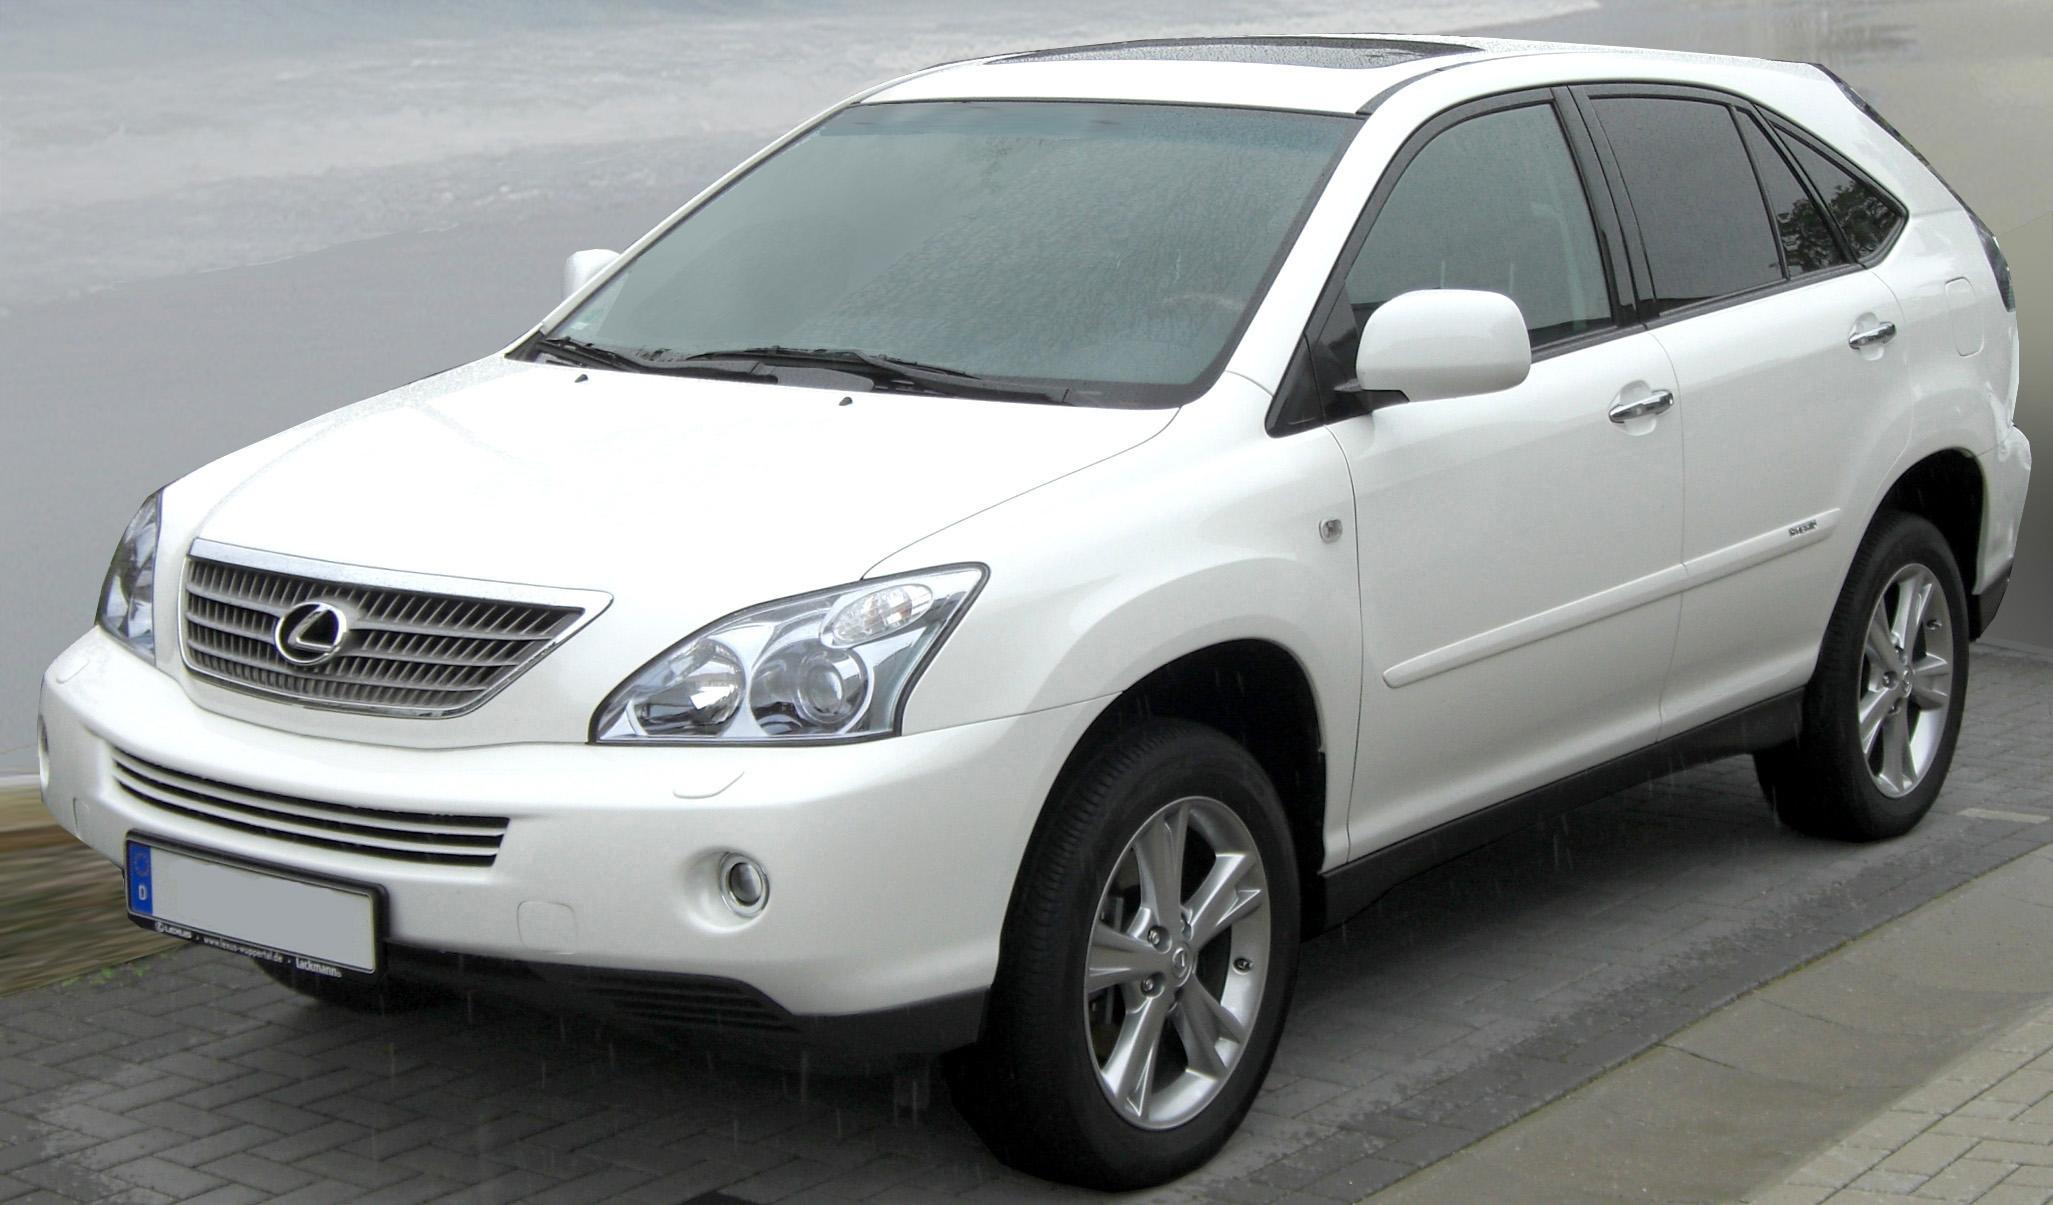 https://upload.wikimedia.org/wikipedia/commons/e/ec/Lexus-RX400h_Crystal_White_Mica.jpg